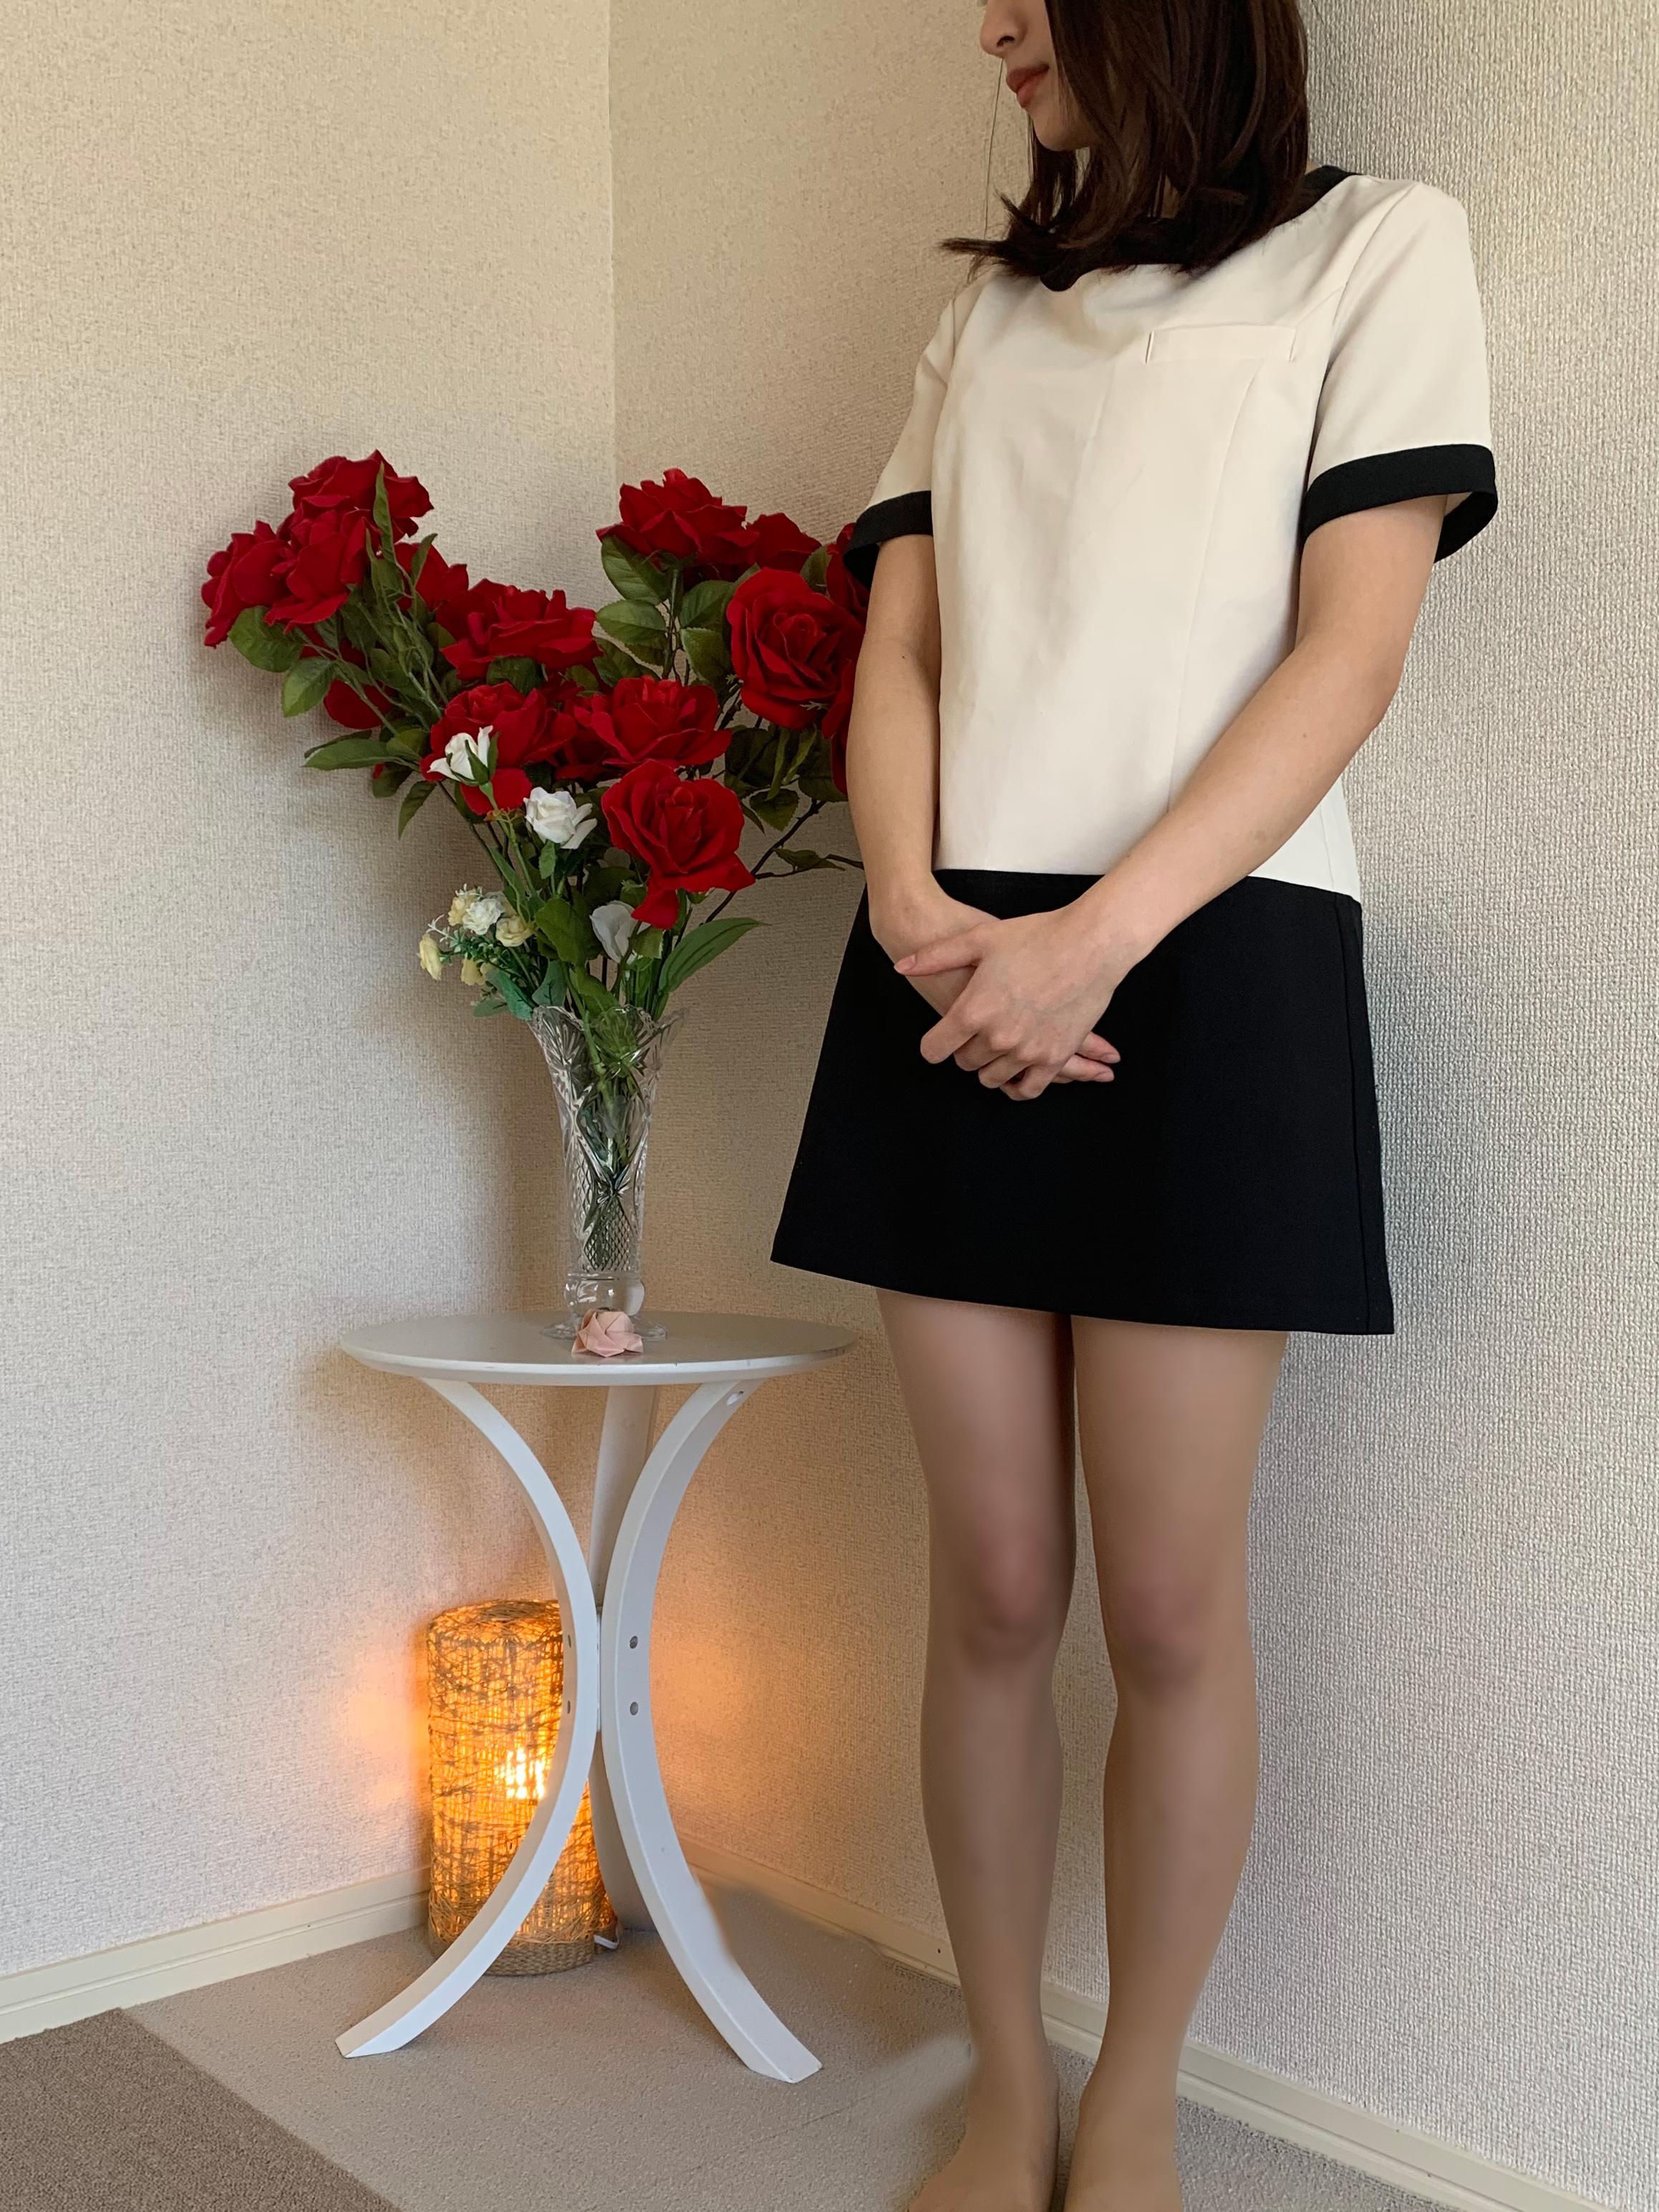 【2月10日(水)5名出勤】